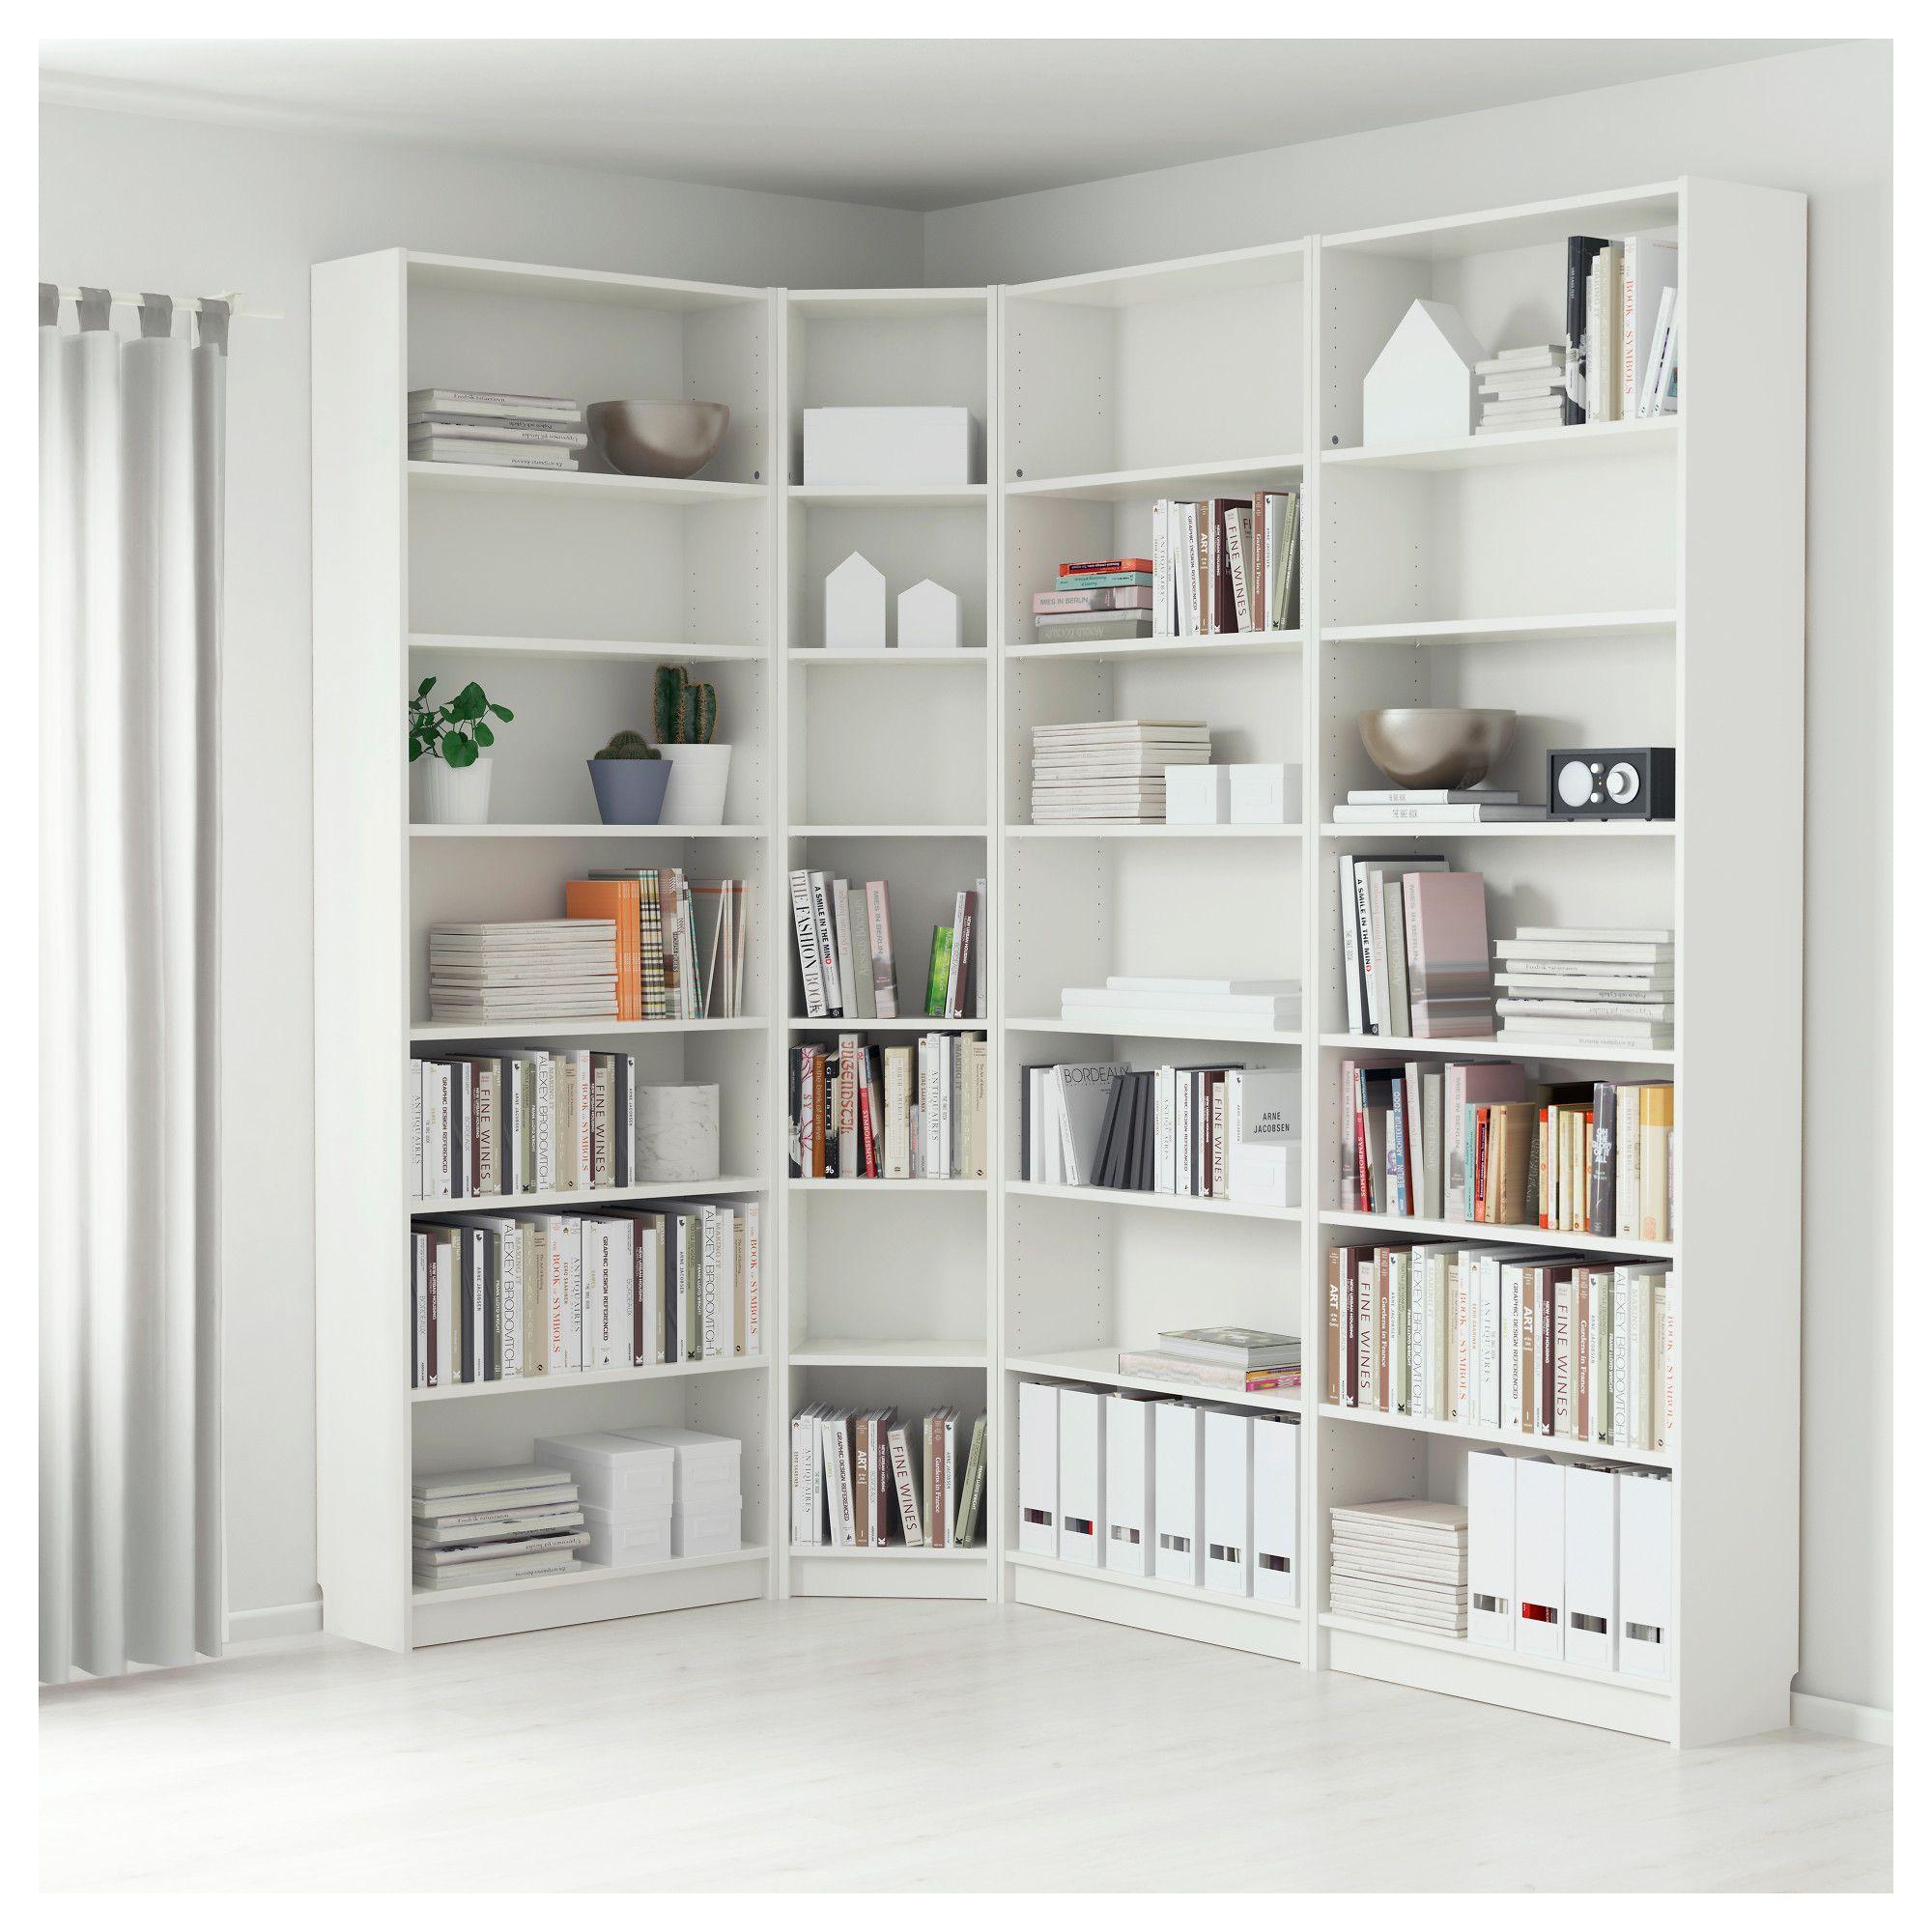 IKEA BILLY Bookcase white Ikea billy bookcase white